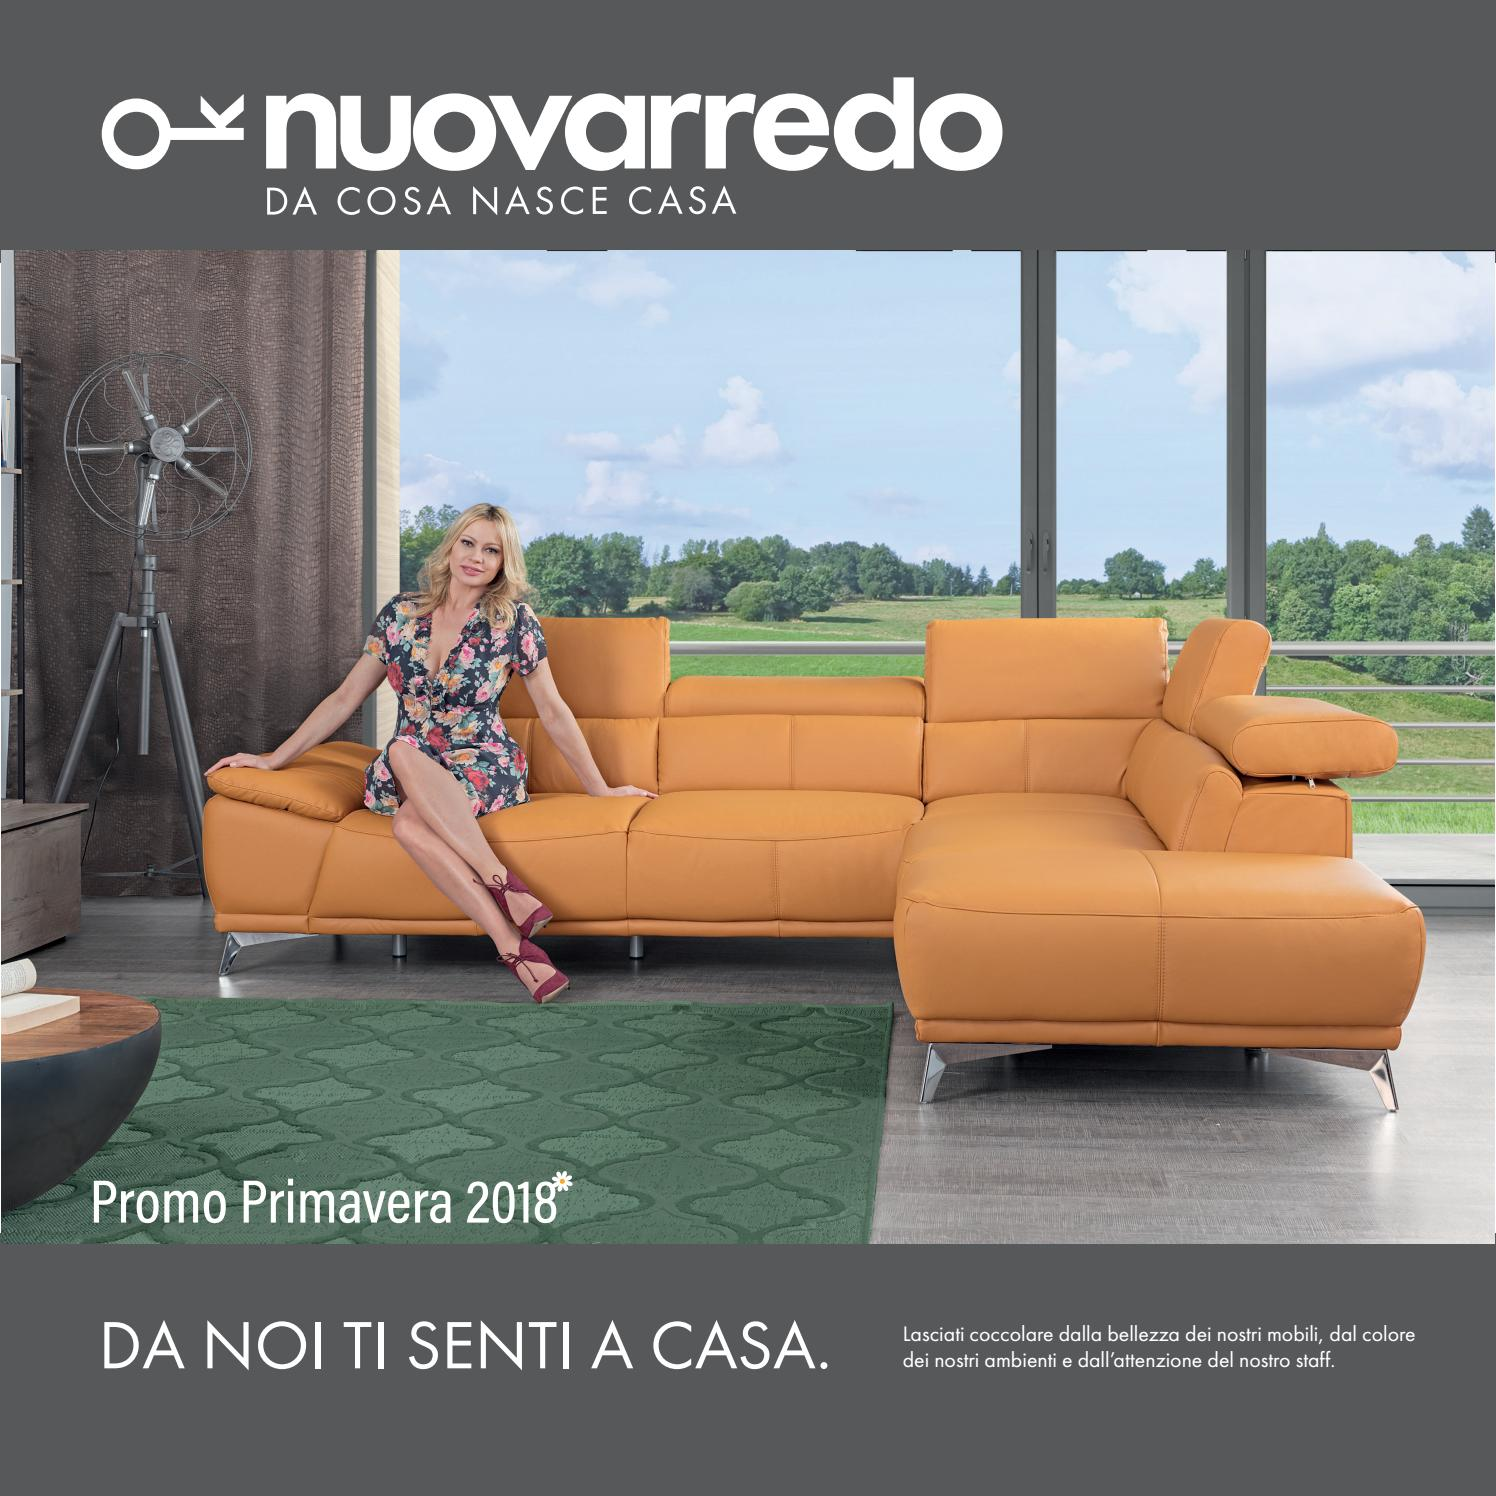 Nuovo Arredo Ascoli Piceno.Nuovo Arredo Francavilla Fontana